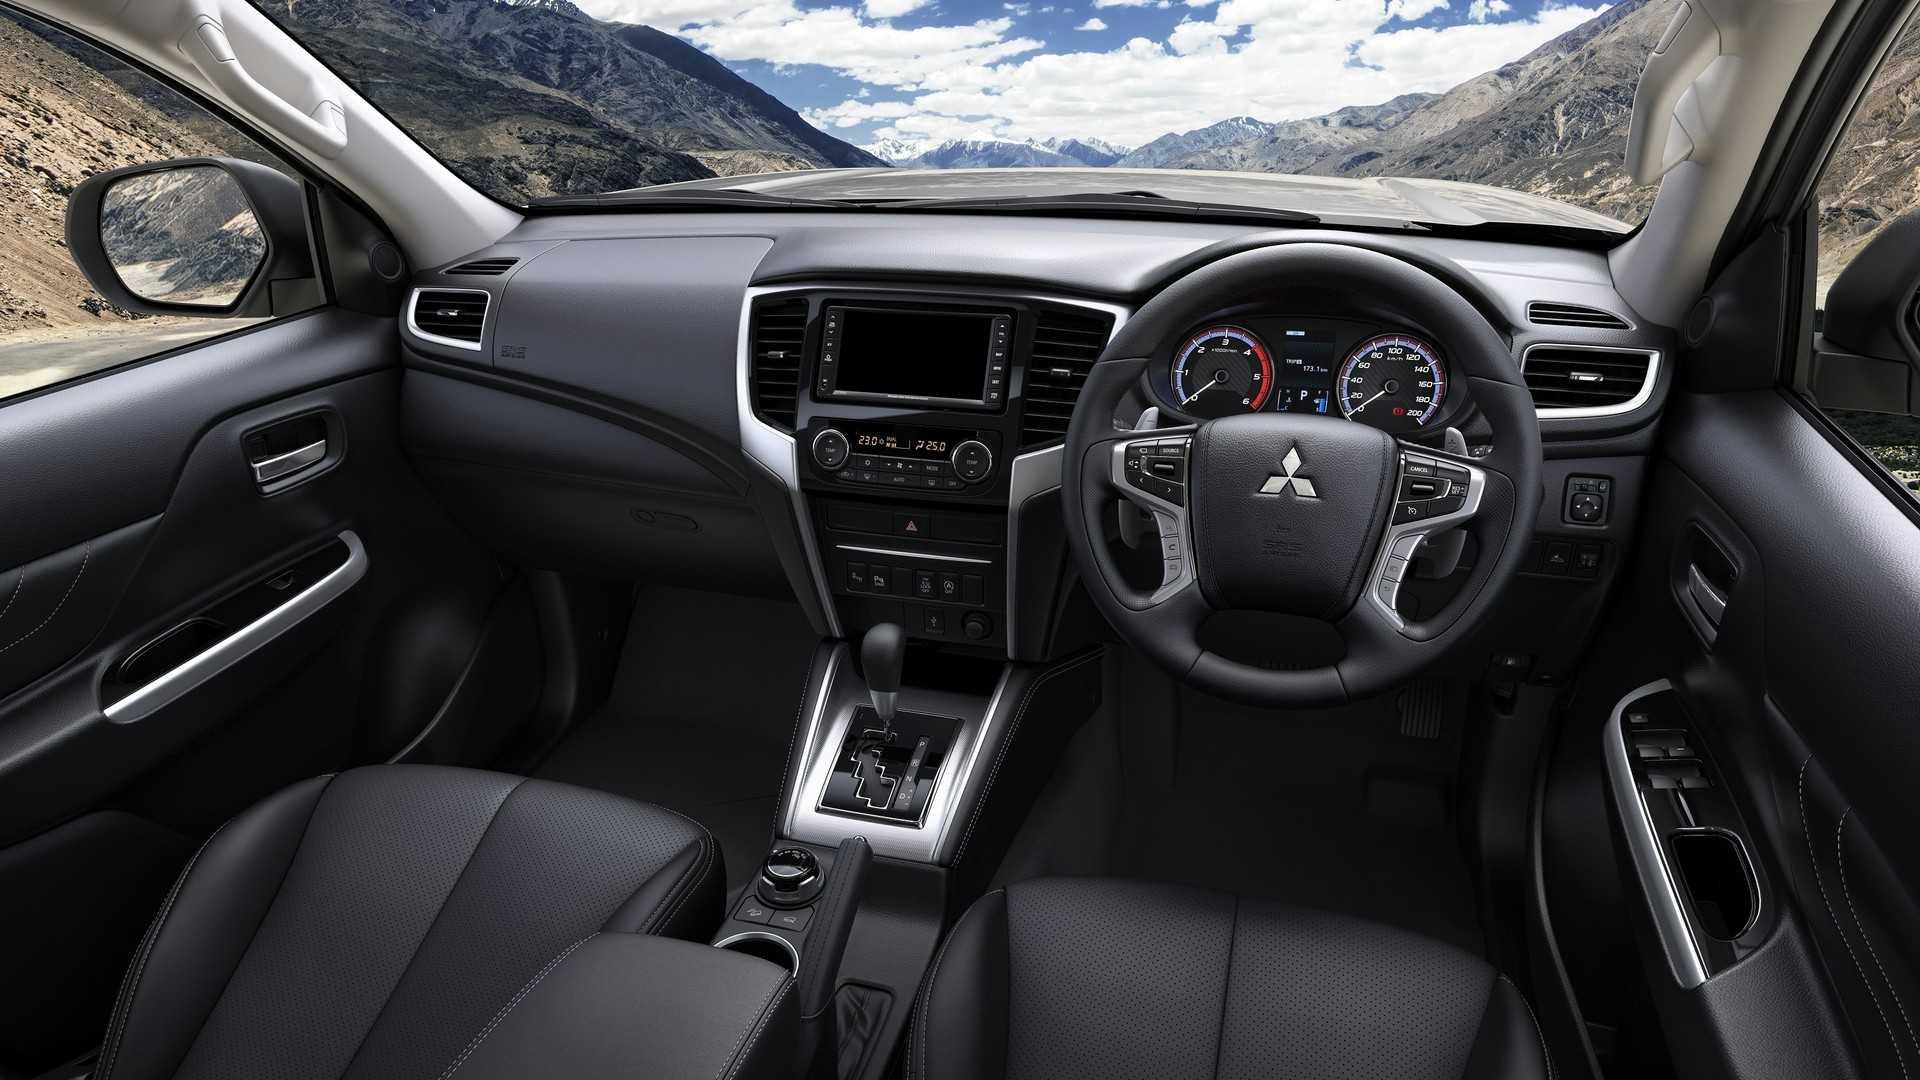 14 Great Nova Mitsubishi L200 Triton 2020 Specs and Review by Nova Mitsubishi L200 Triton 2020